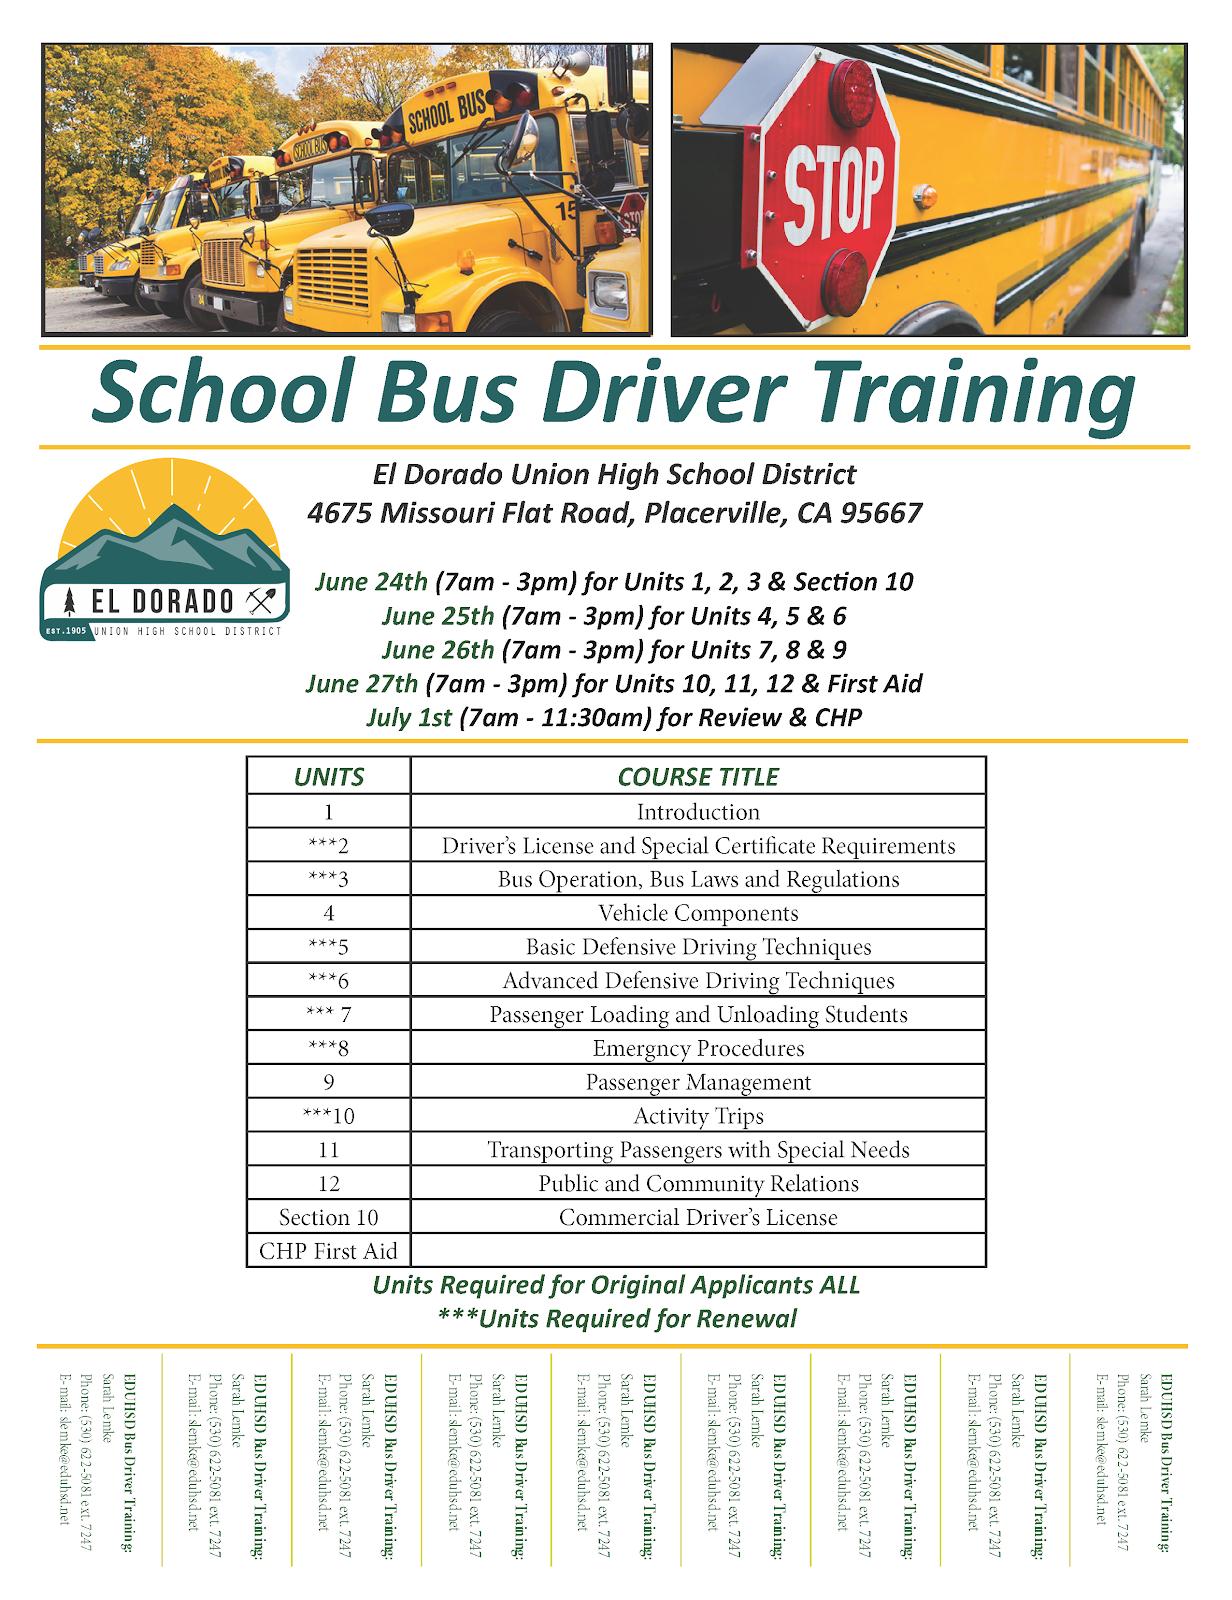 School Bus Driver Training. El Dorado Union High School District. 4675 Missouri Flat Road, Placerville, CA 95667. June 24th. 7am to 3pm for units 1, 2, 3, and section 10. June 25th. 7am to 3pm for units 4, 5, 6. June 26th. 7am to 3pm for units 7, 8, 9. June 27th. 7am to 3pm for units 10, 11, 12 and first aid. July 1st. 7am to 11:30am. For review and CHP. Unit 1. Introduction. Unit 2. Driver's license and special certificate requirements. Unit 3. Bus operation, bus laws and regulations. Unit 4. Vehicle components. Unit 5. Basic defense driving techniques. Unit 6. Advanced defensive driving techniques. Unit 7. Passenger loading and unloading students. Unit 8. Emergency procedures. Unit 9. Passenger management. Unit 10. Activity trips. Unit 11. Transporting passengers with special needs. Unit 12. Public and community relations. Section 10. Commercial Driver's License. CHP First Aid. EDUHSD Bus Driver Training. Sarah Lemke. Phone. 530,622,5081 extension 7247. Email. slemke@eduhsd.net.